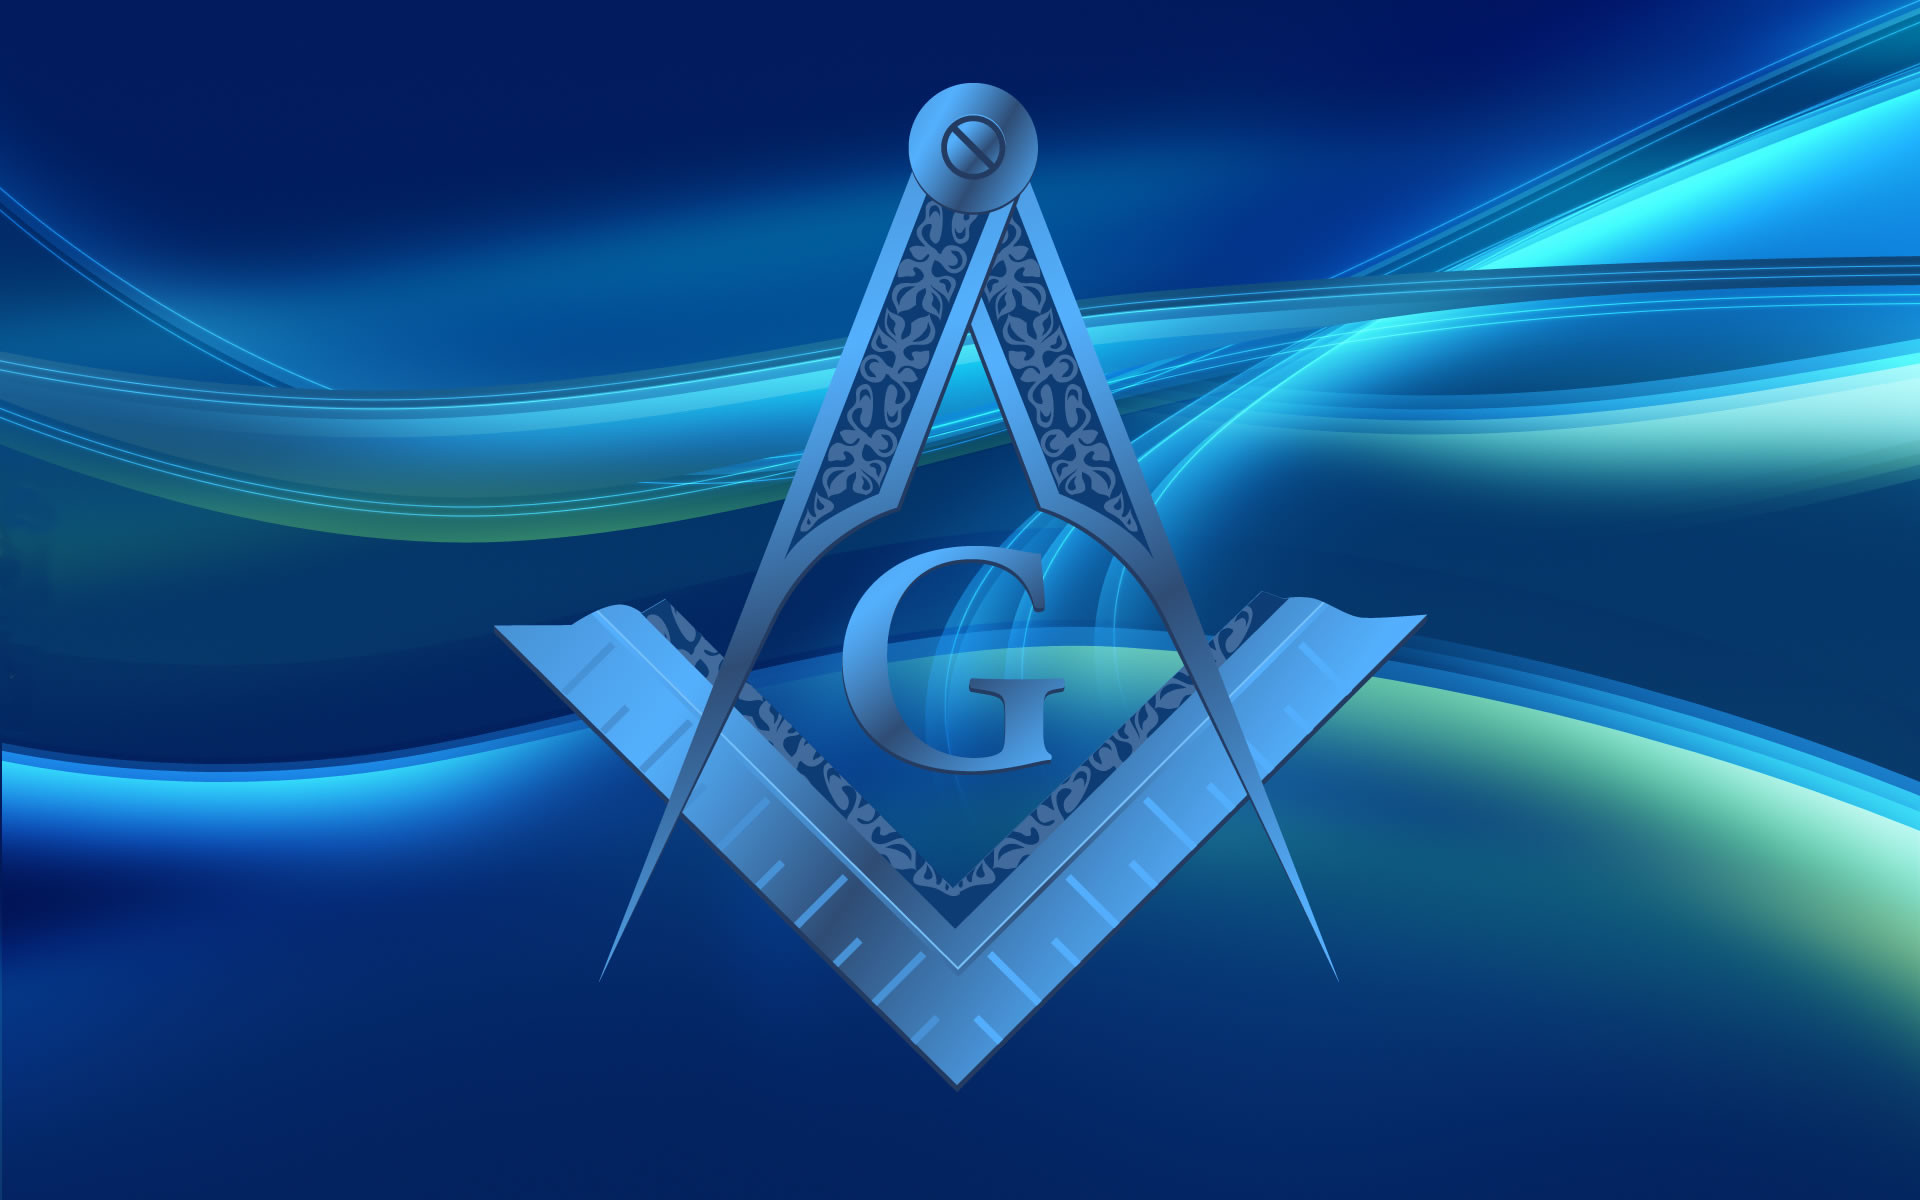 freemason wallpaper – Pensacola Lodge #42, F. & A.M.